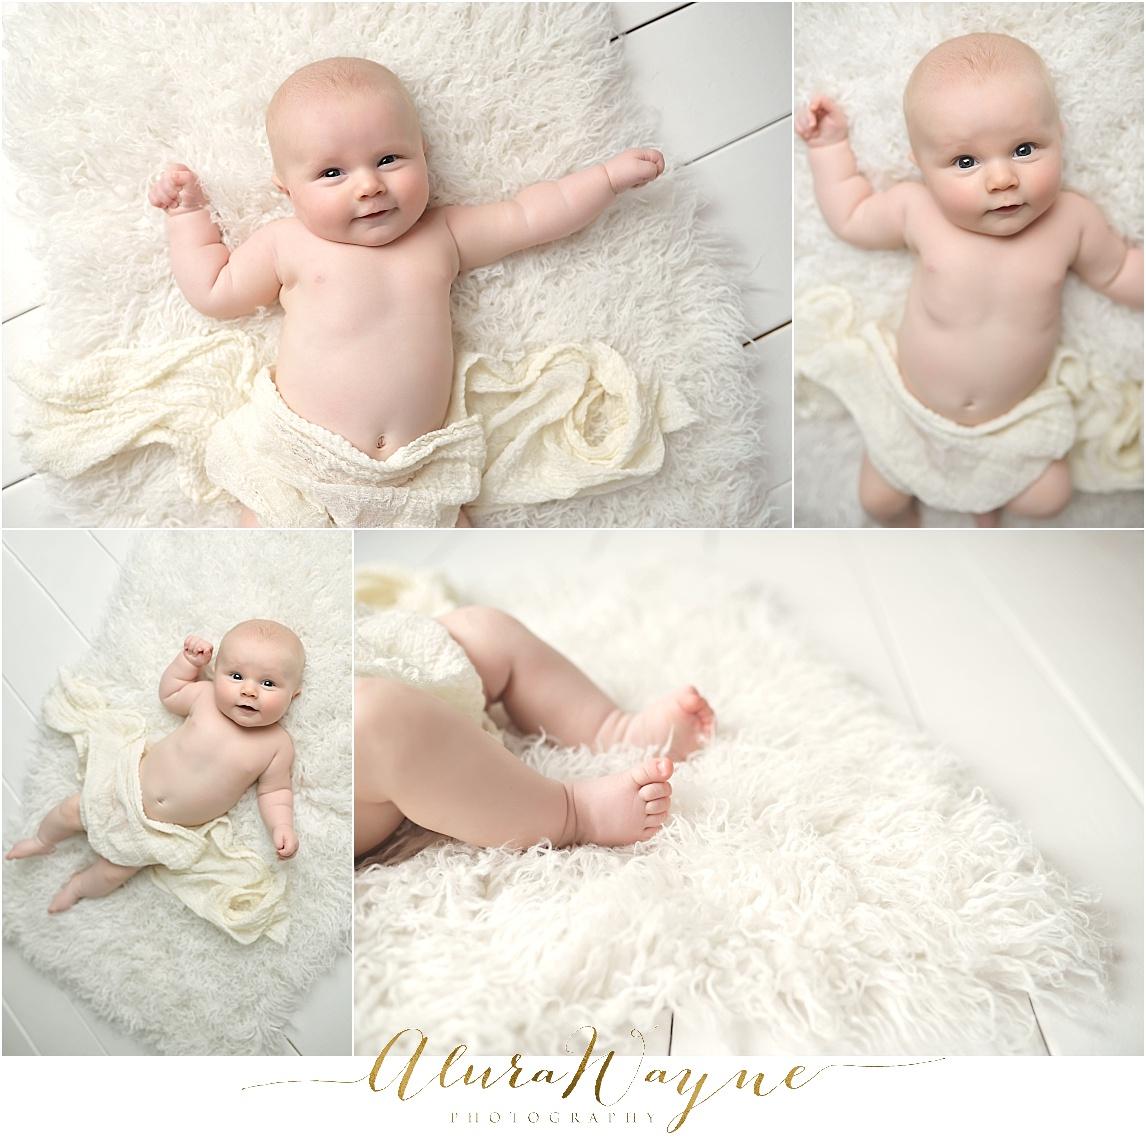 milestone session, nashville, tn alurawayne photography 3 month baby boy